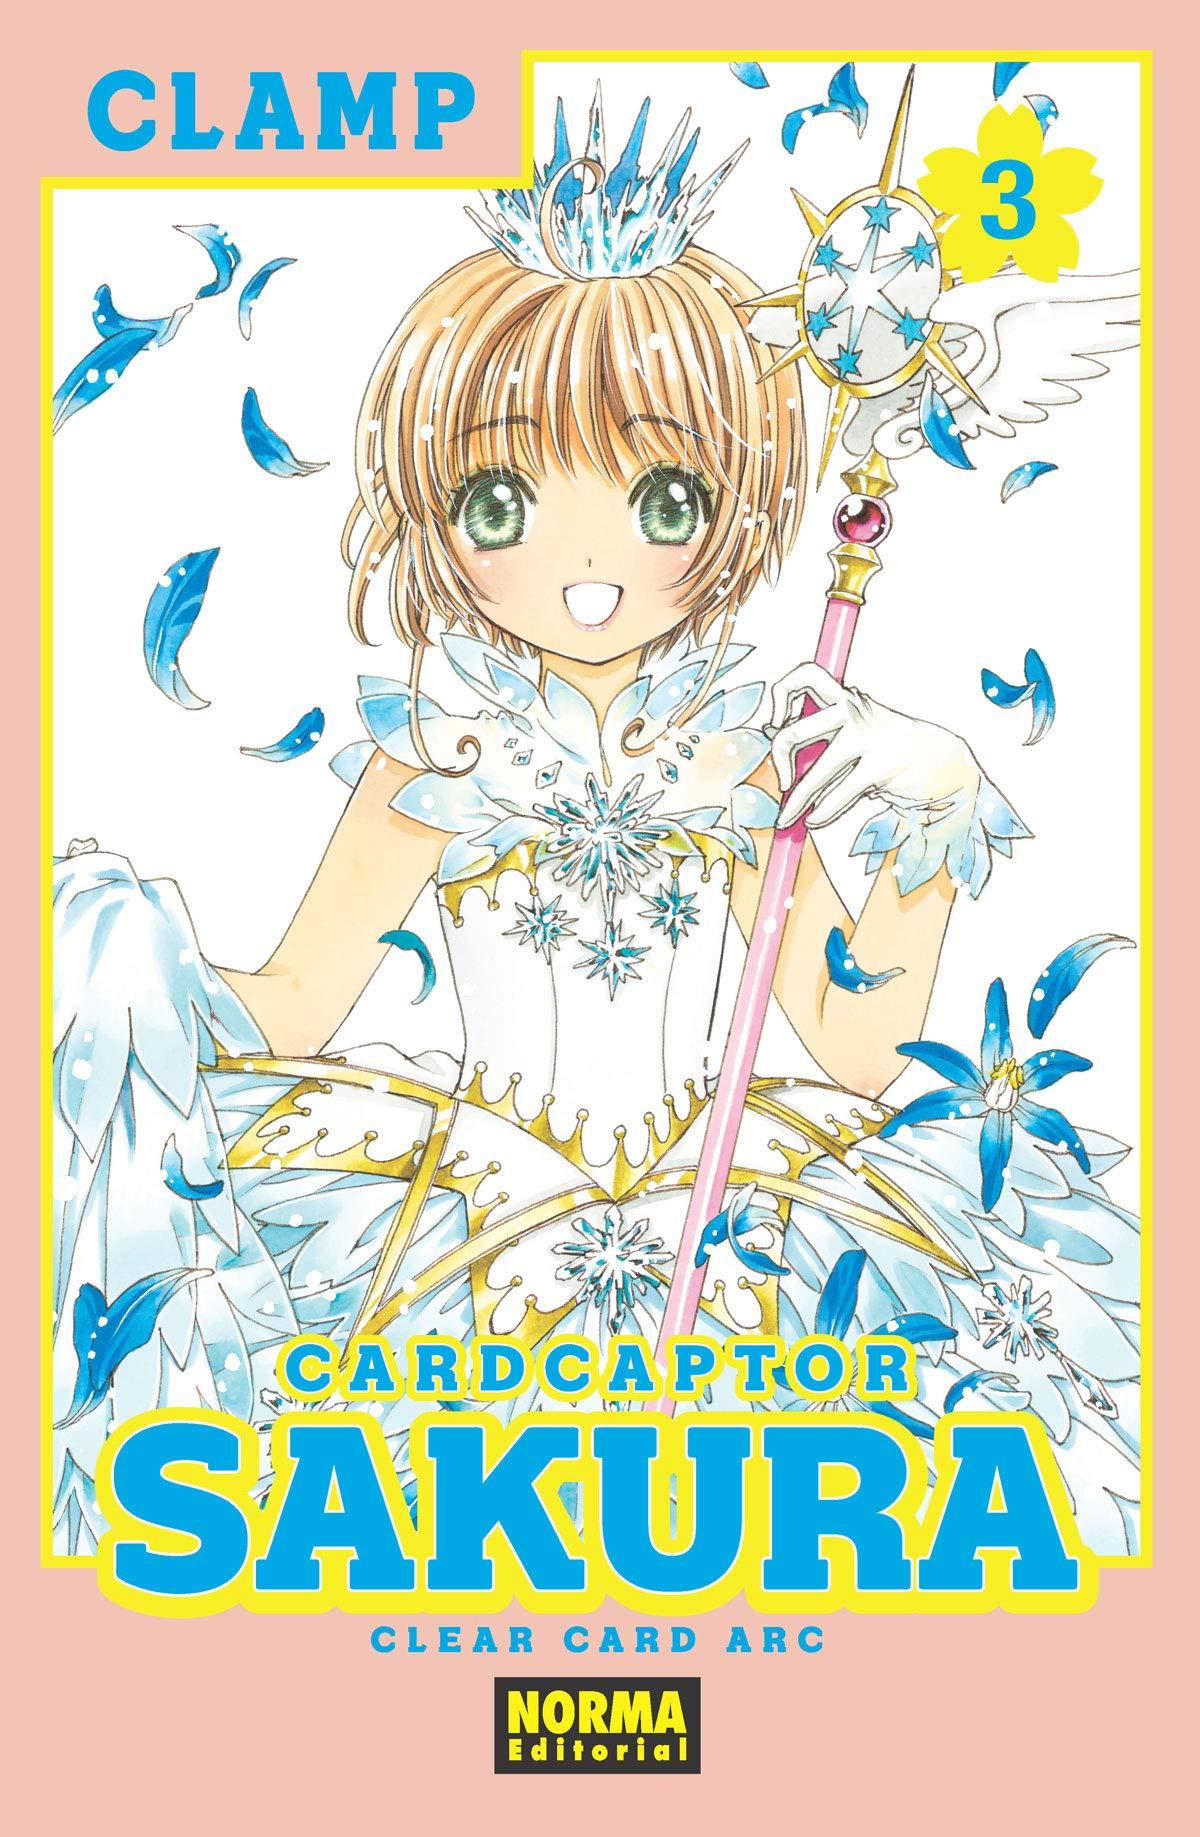 Card Captor Sakura Clear Card Arc 3 Tapa blanda – 31 oct 2018 CLAMP NORM8 #Norma Editorial 8467932791 FX